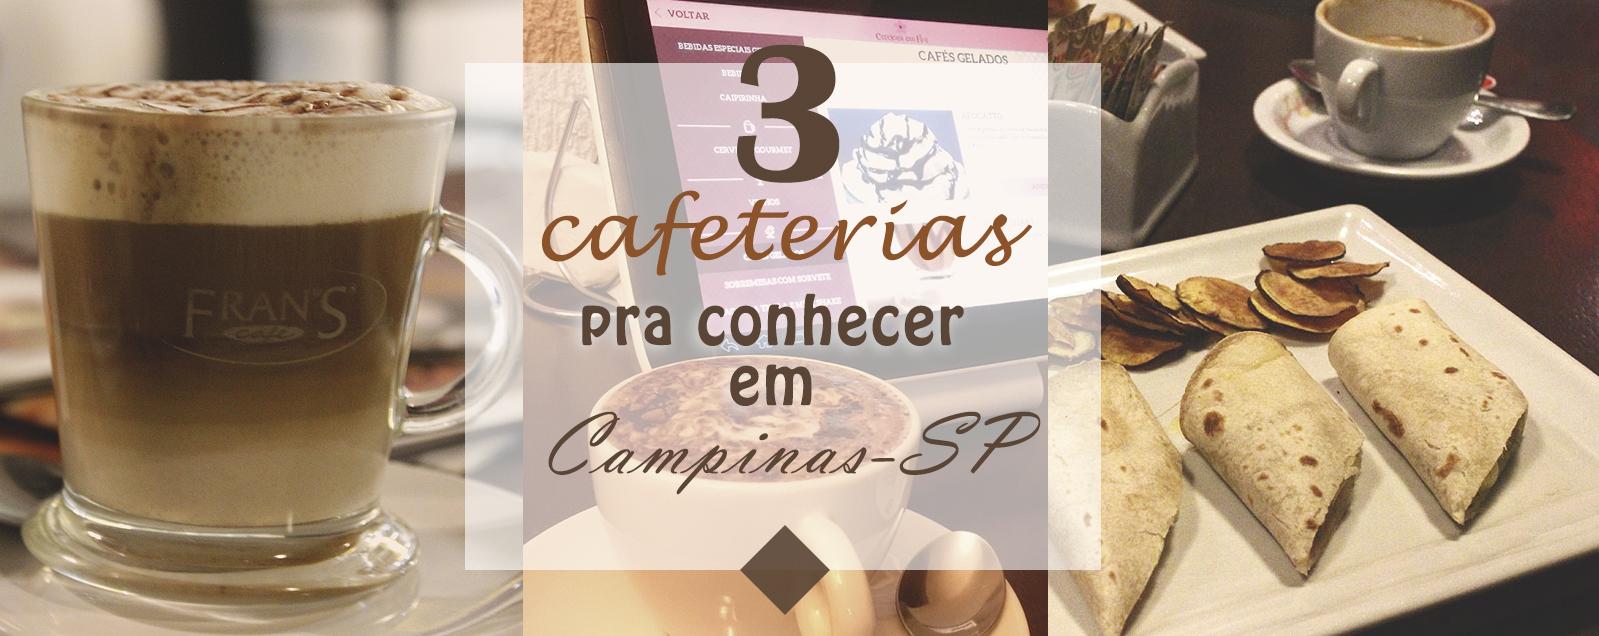 capa 3 cafeterias campinas